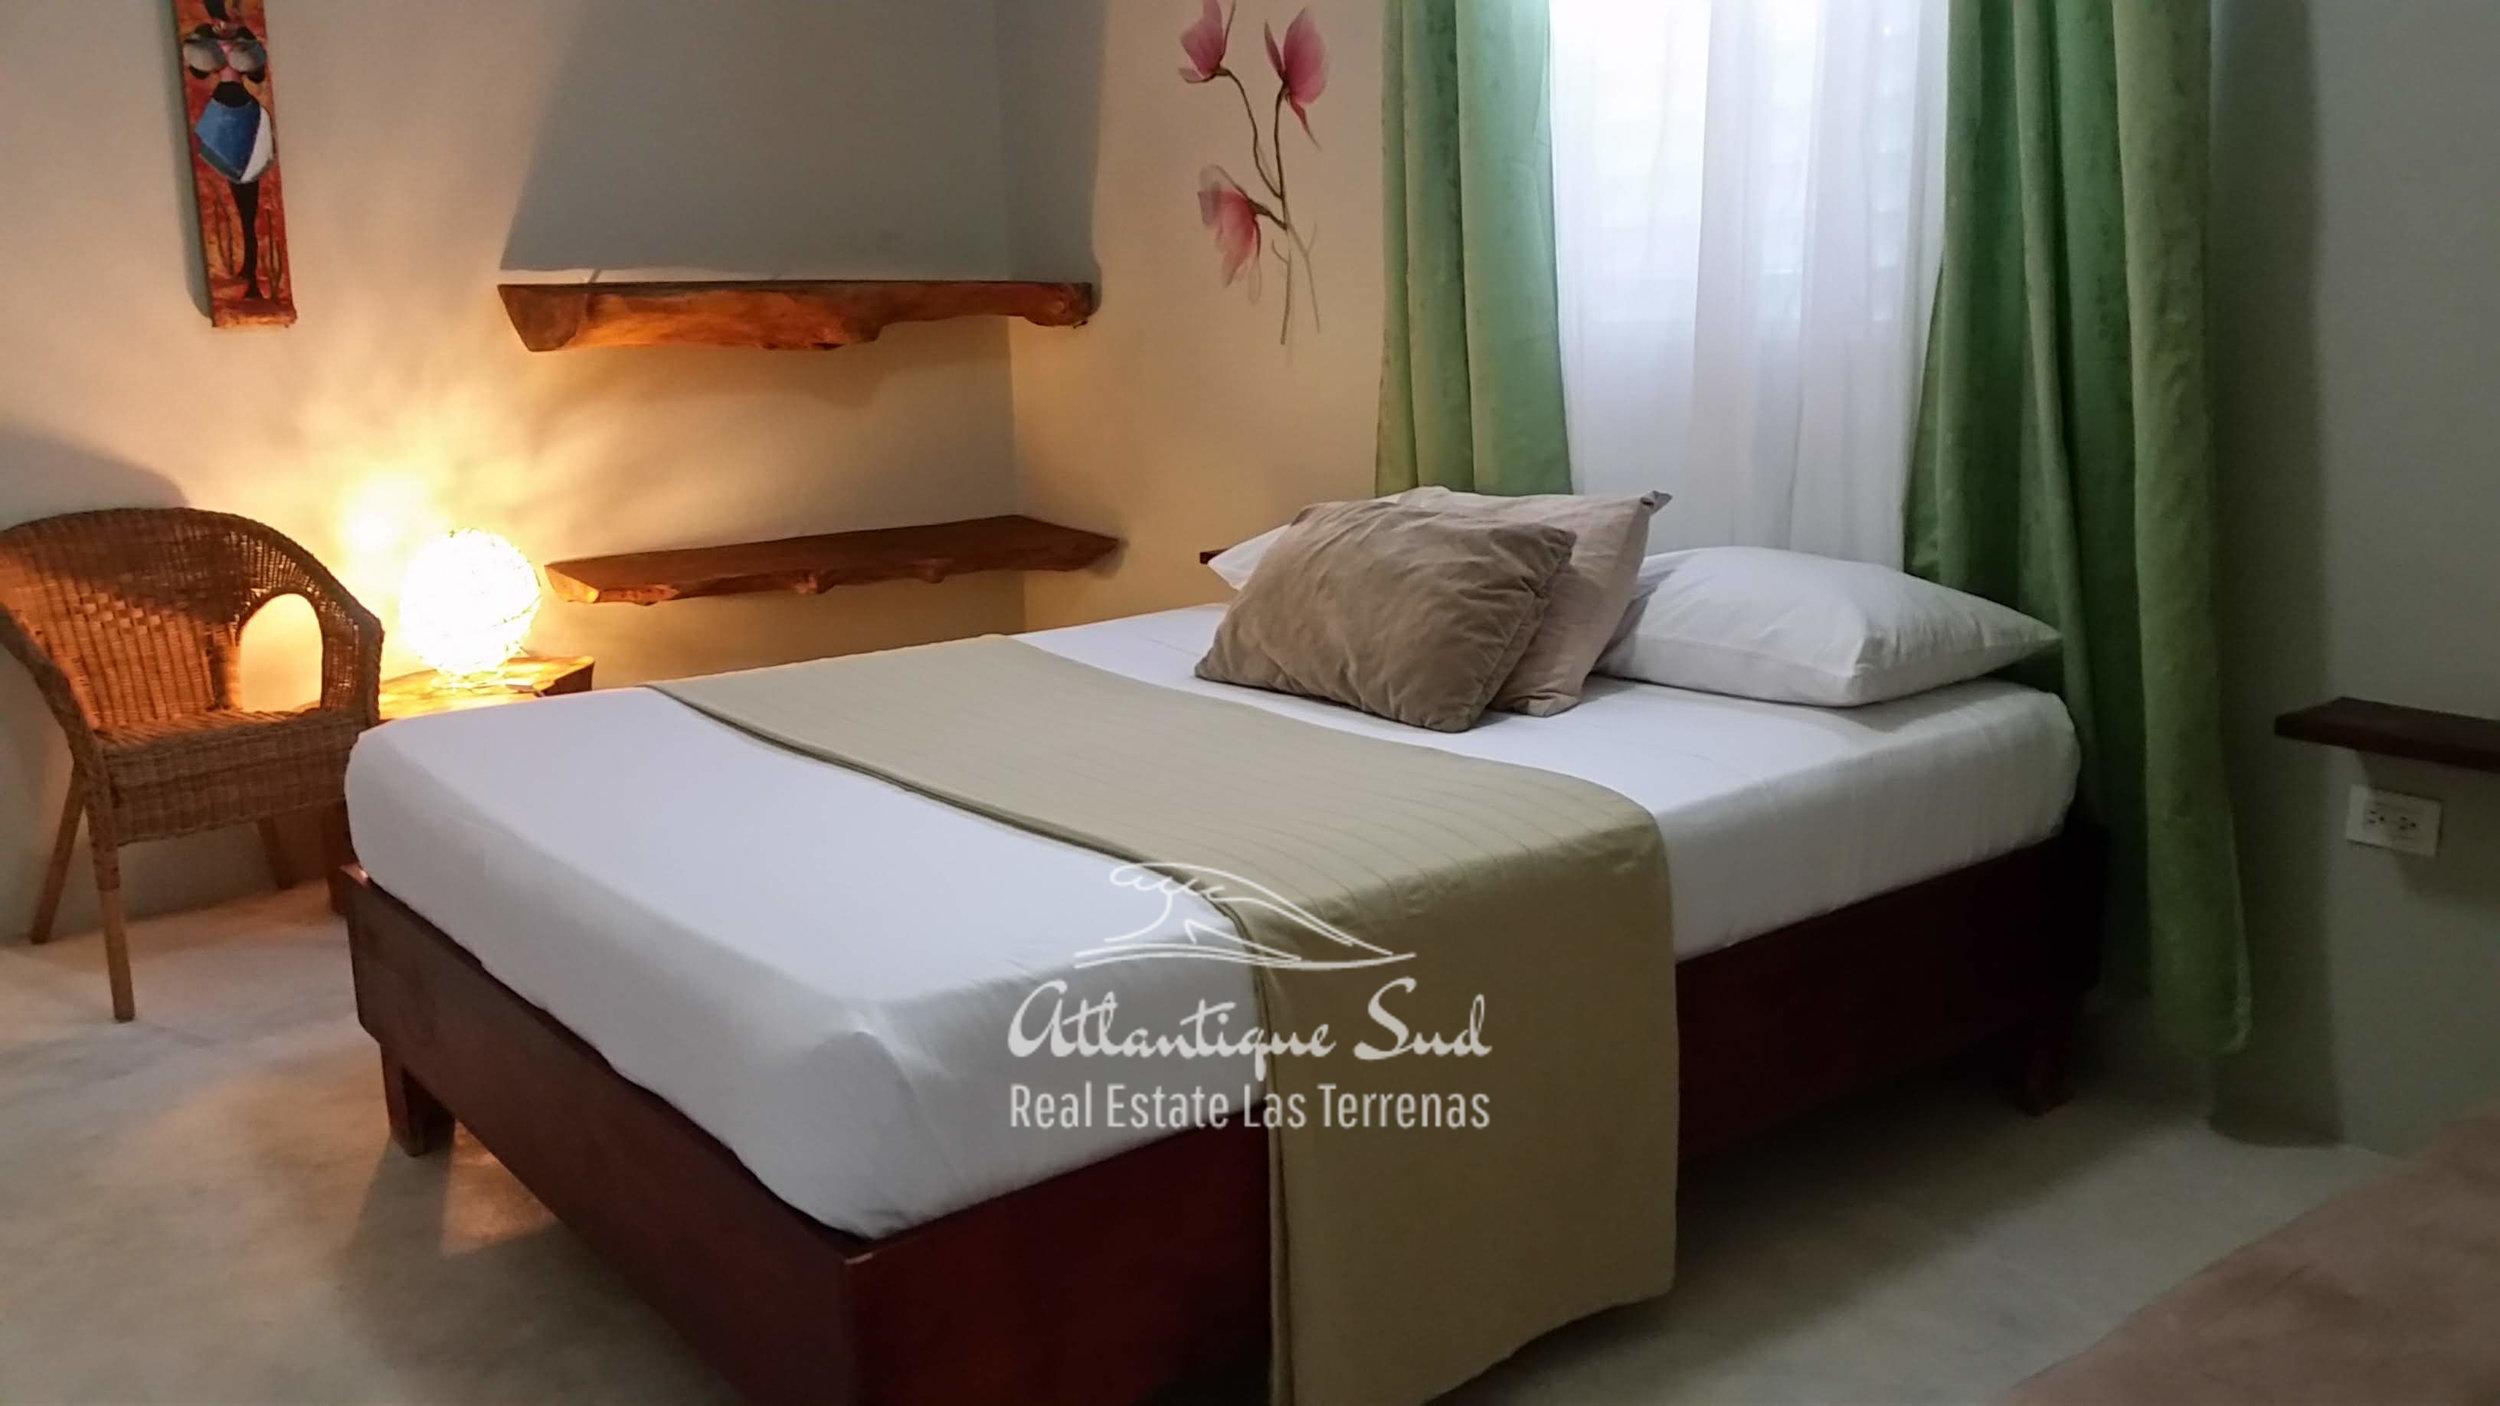 Typical caribbean hotel for sale Real Estate Las Terrenas Dominican Republic Atlantique Sud18.jpg